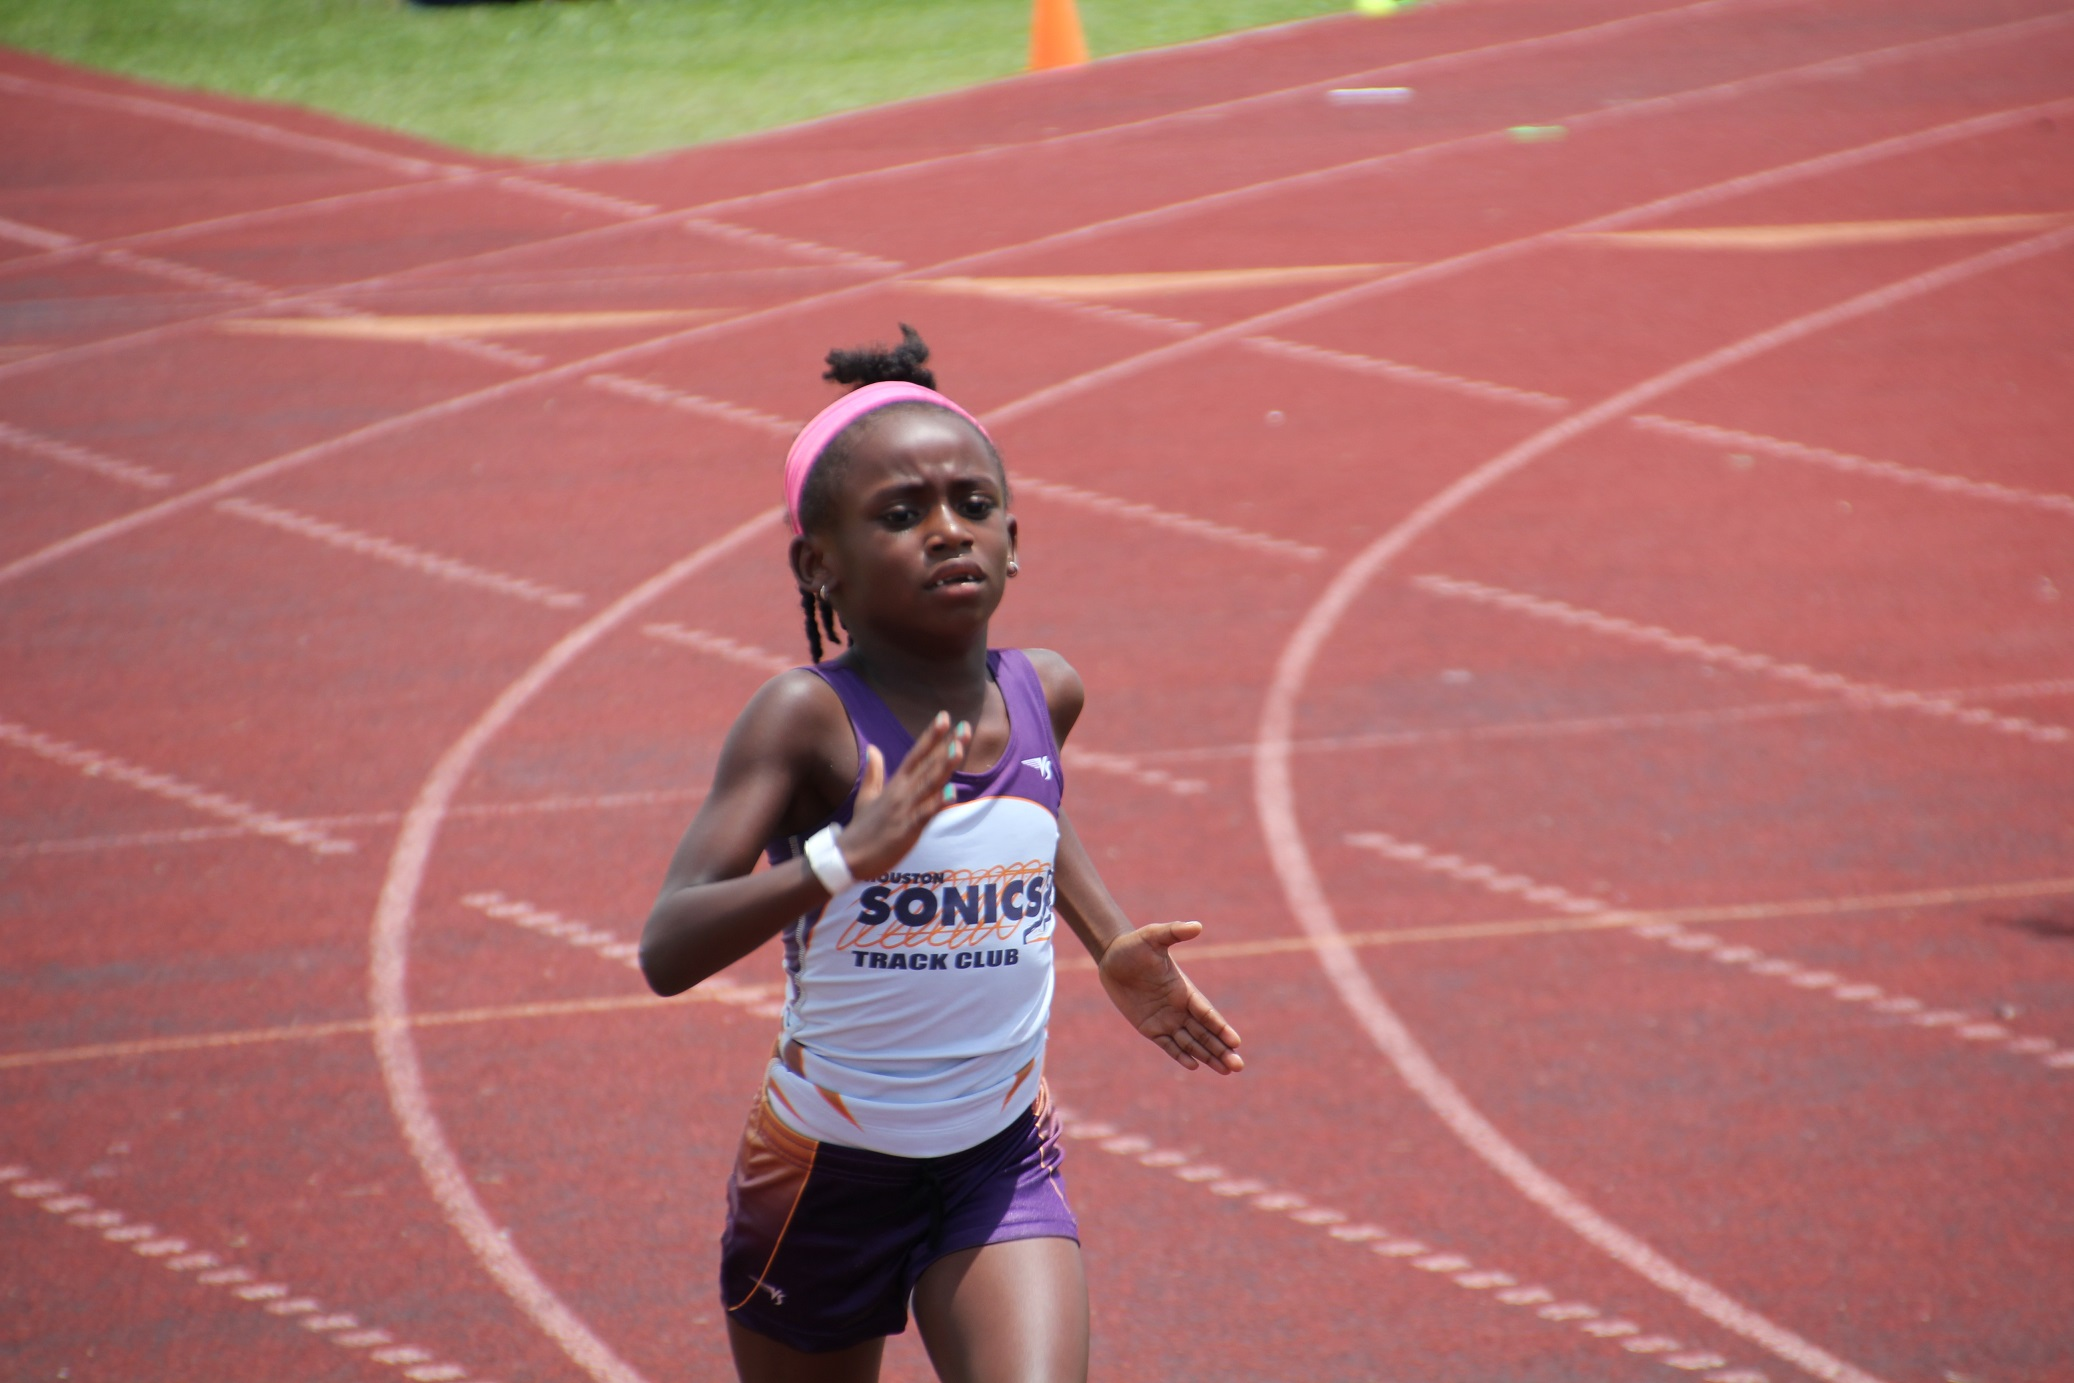 Ryann running the 400m